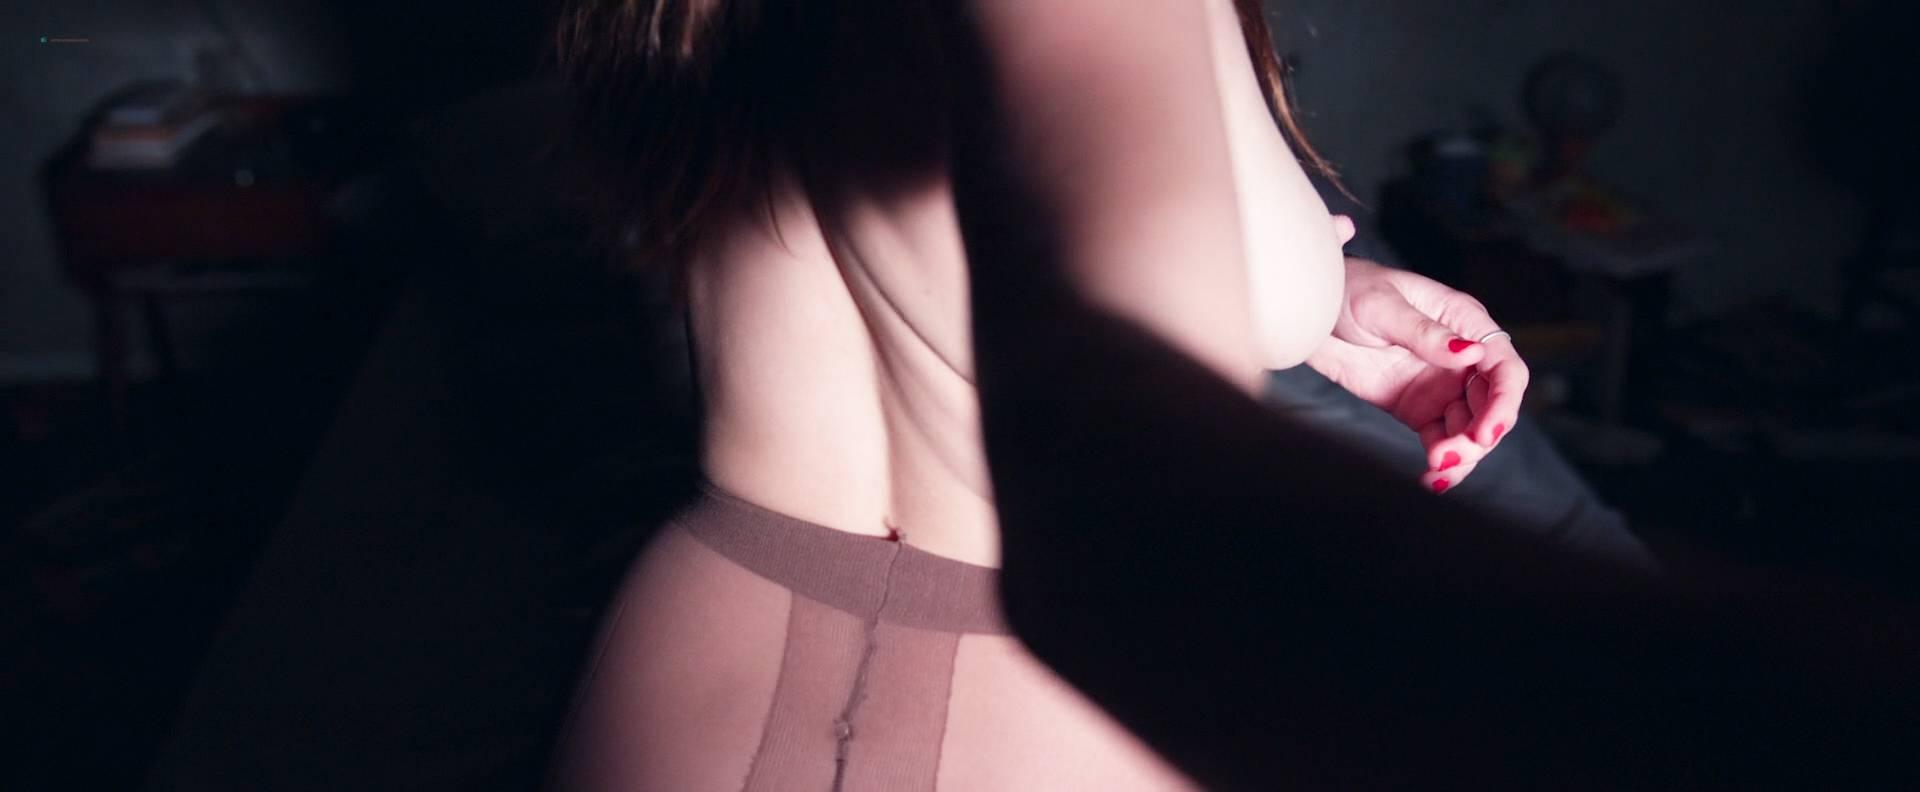 Lita from wwe fake nudes-2759